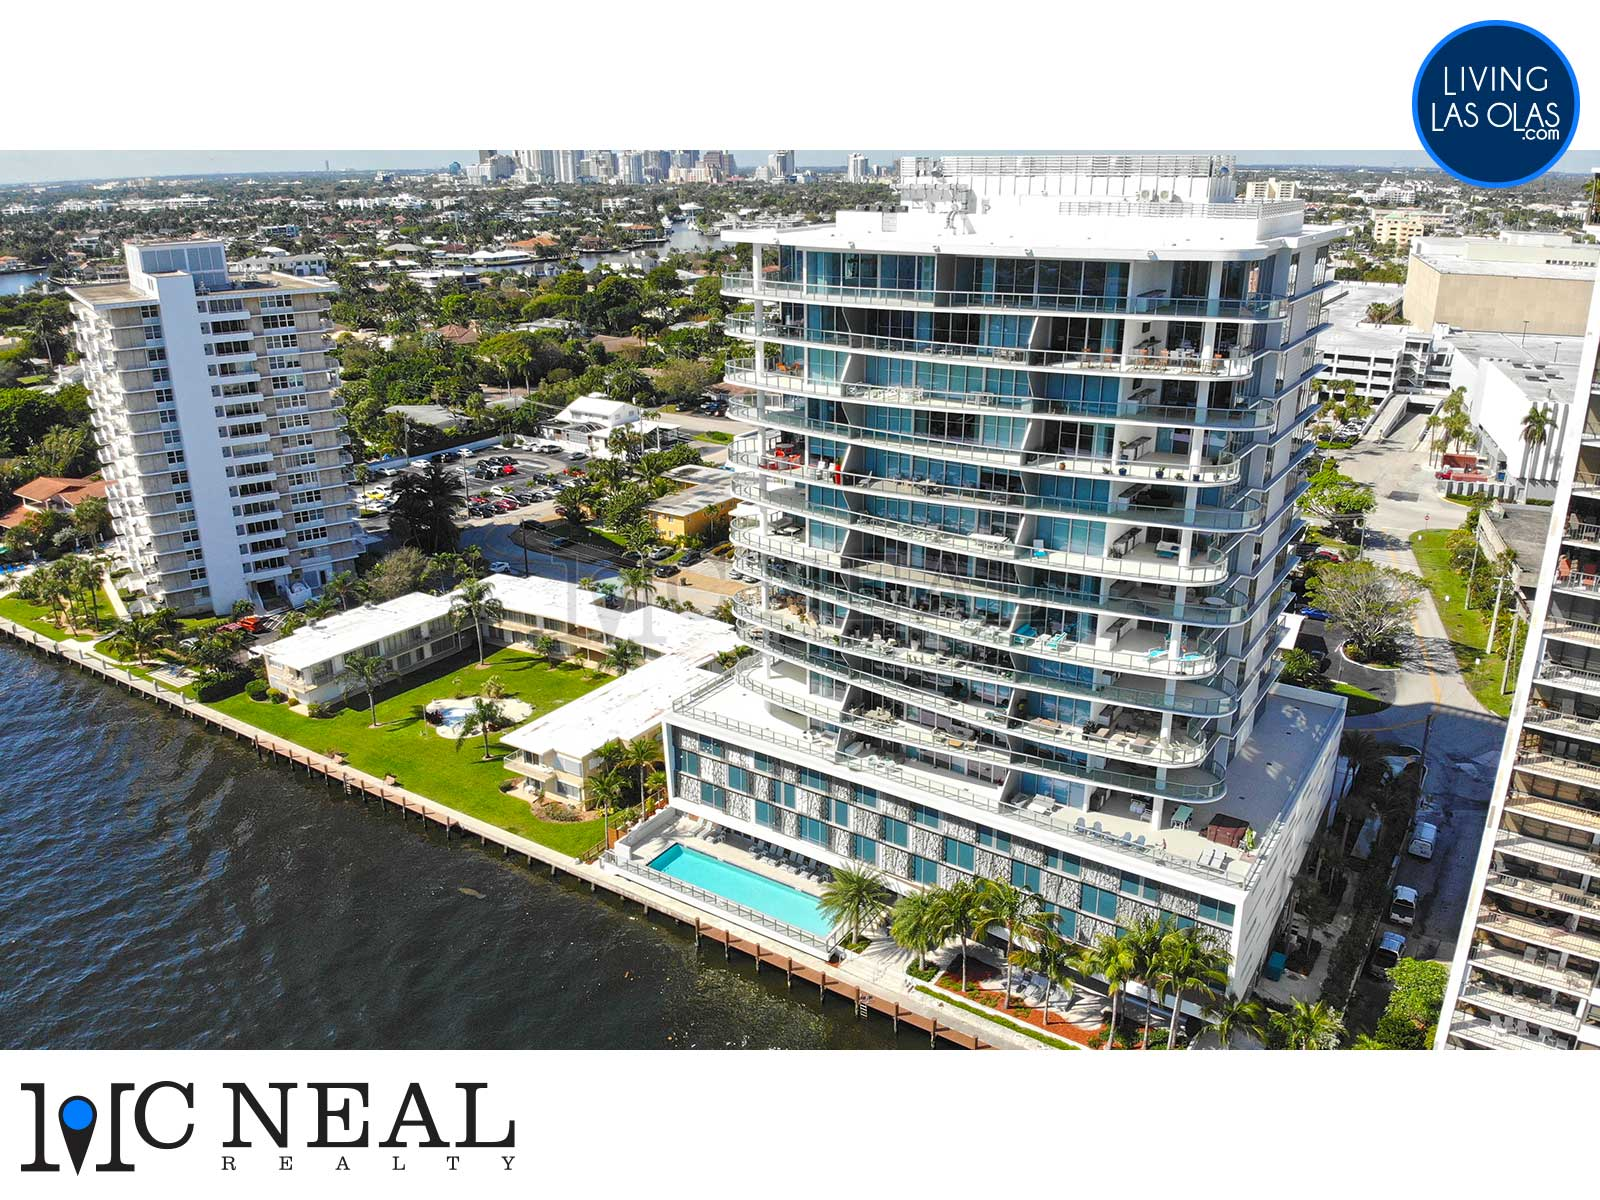 Sunrise Neighborhood Fort Lauderdale Homes Real Estate 04